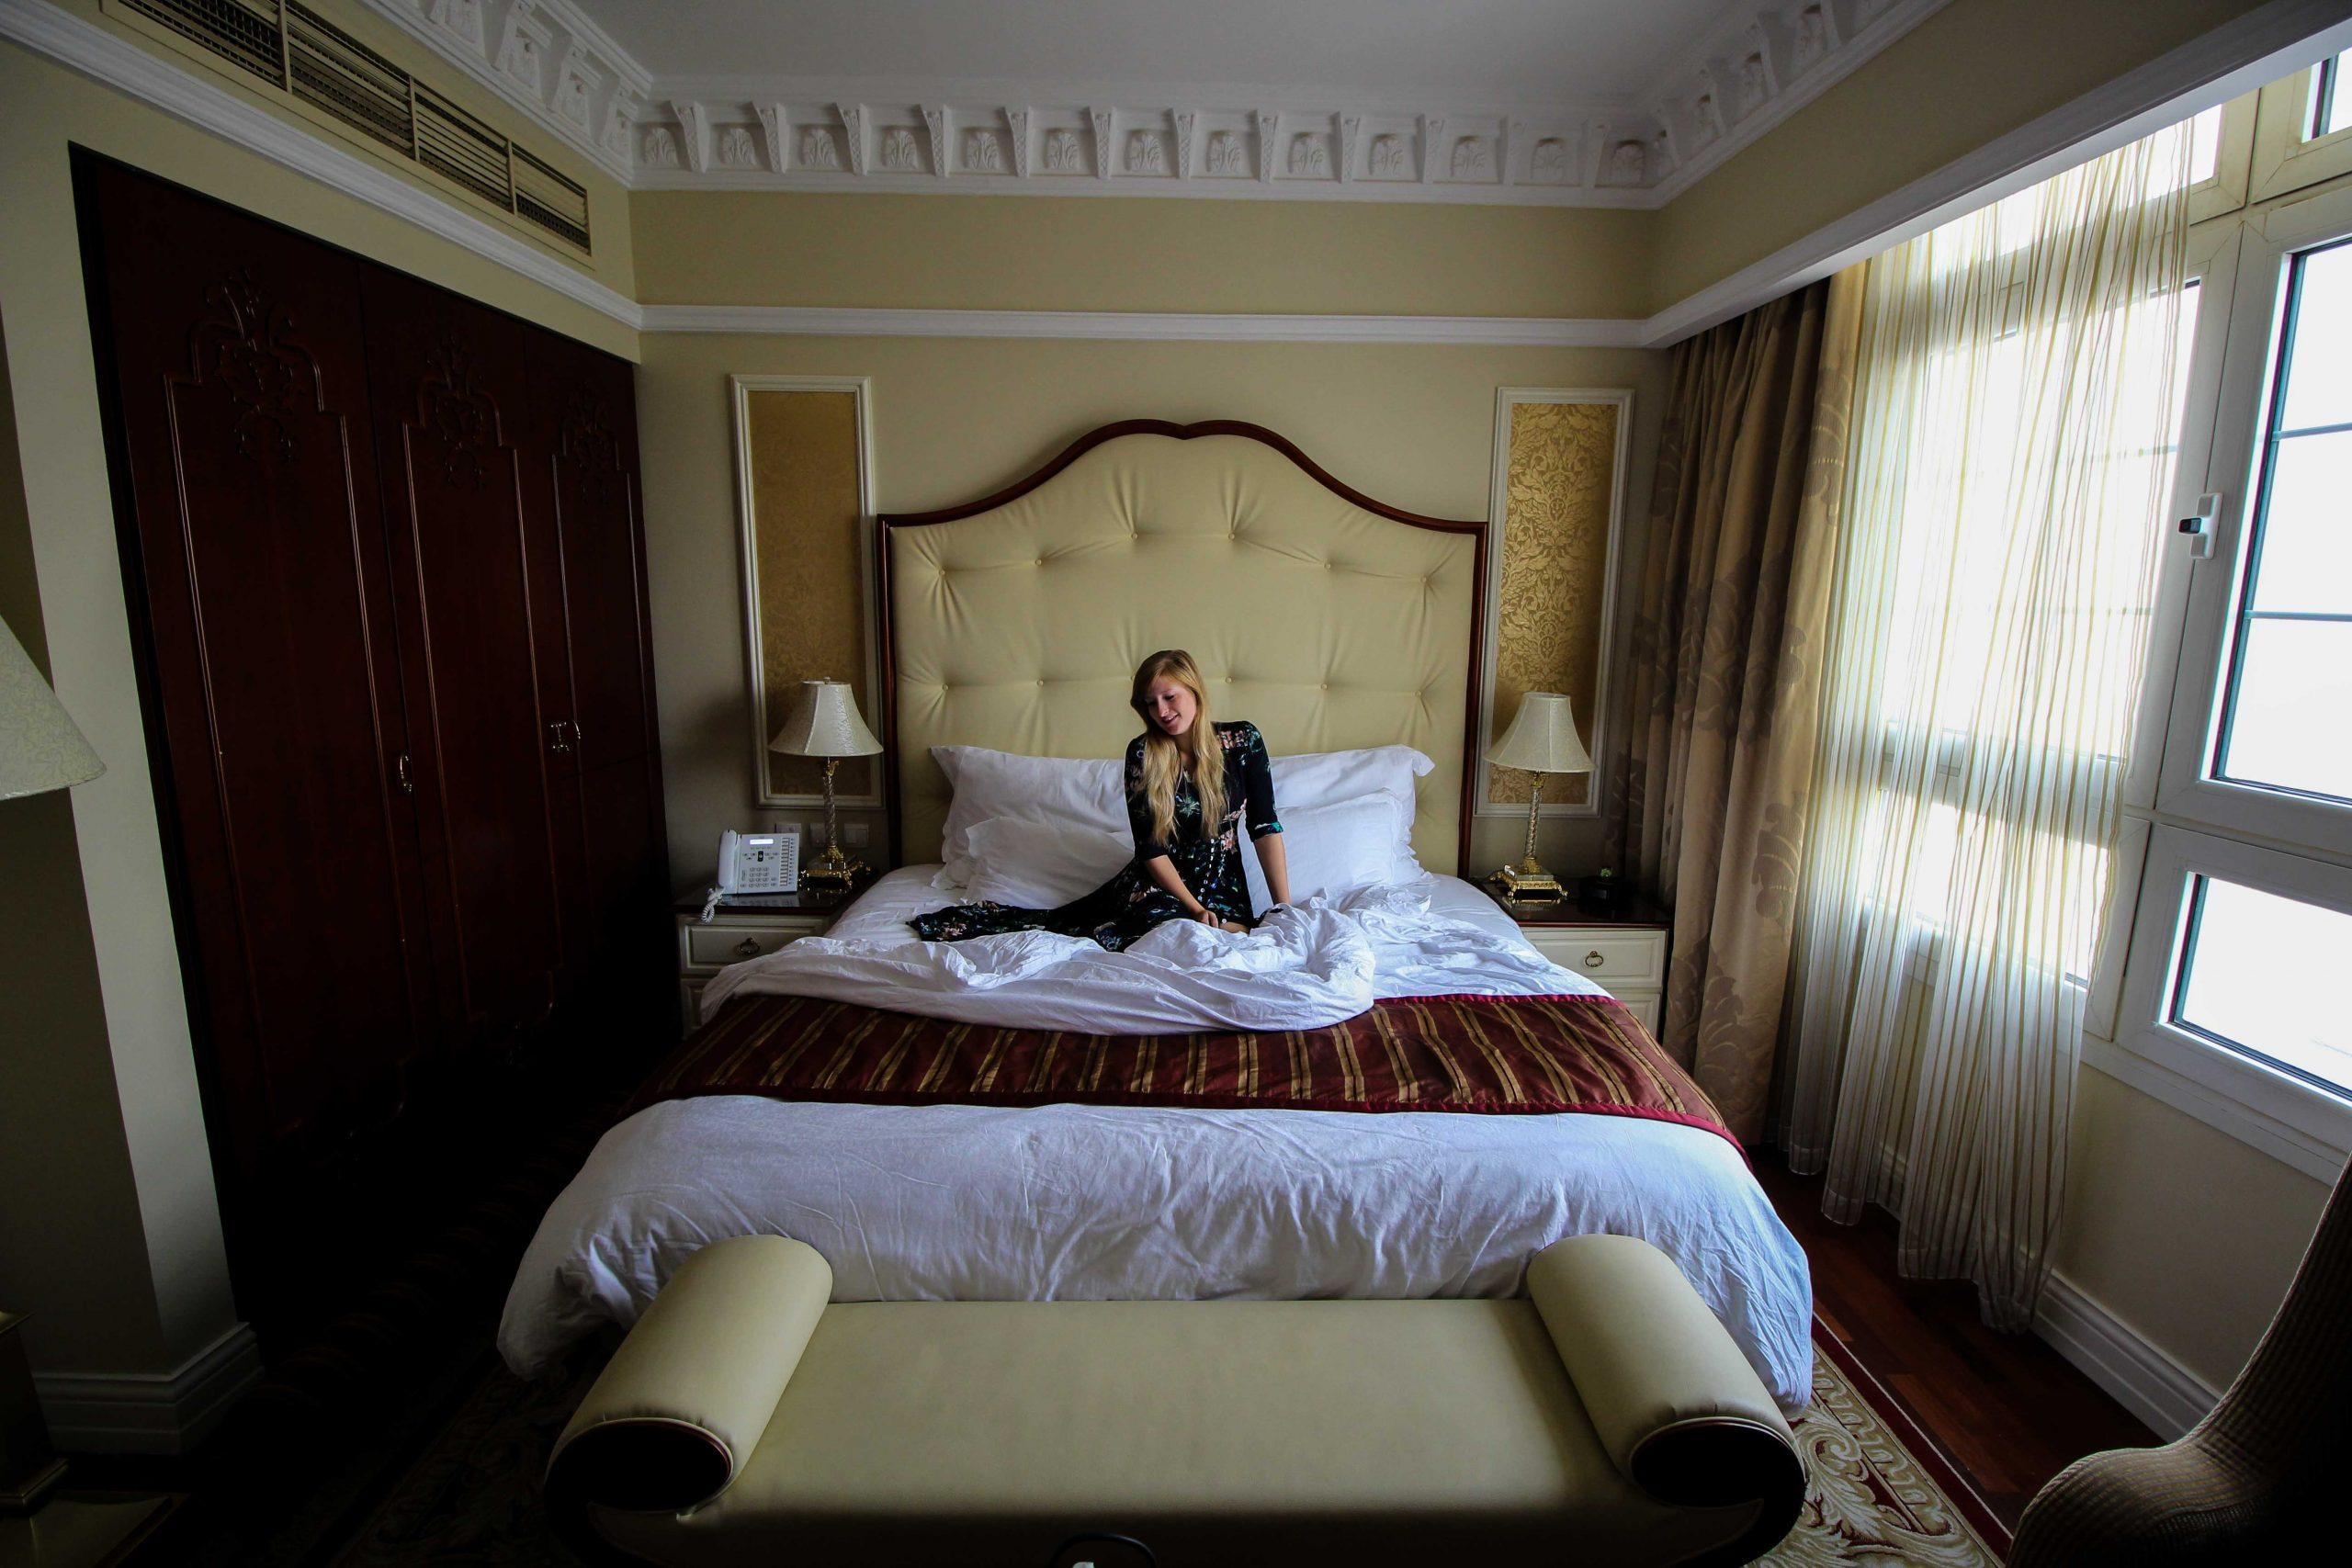 Full Size of Warwick Hotel Doha Executive Room Kingsize Bett Luxushotel 5 Balken Mit Schubladen 90x200 Weiß Boxspring Hohes Kopfteil Ebay Betten 180x200 Hunde Bettkasten Bett King Size Bett